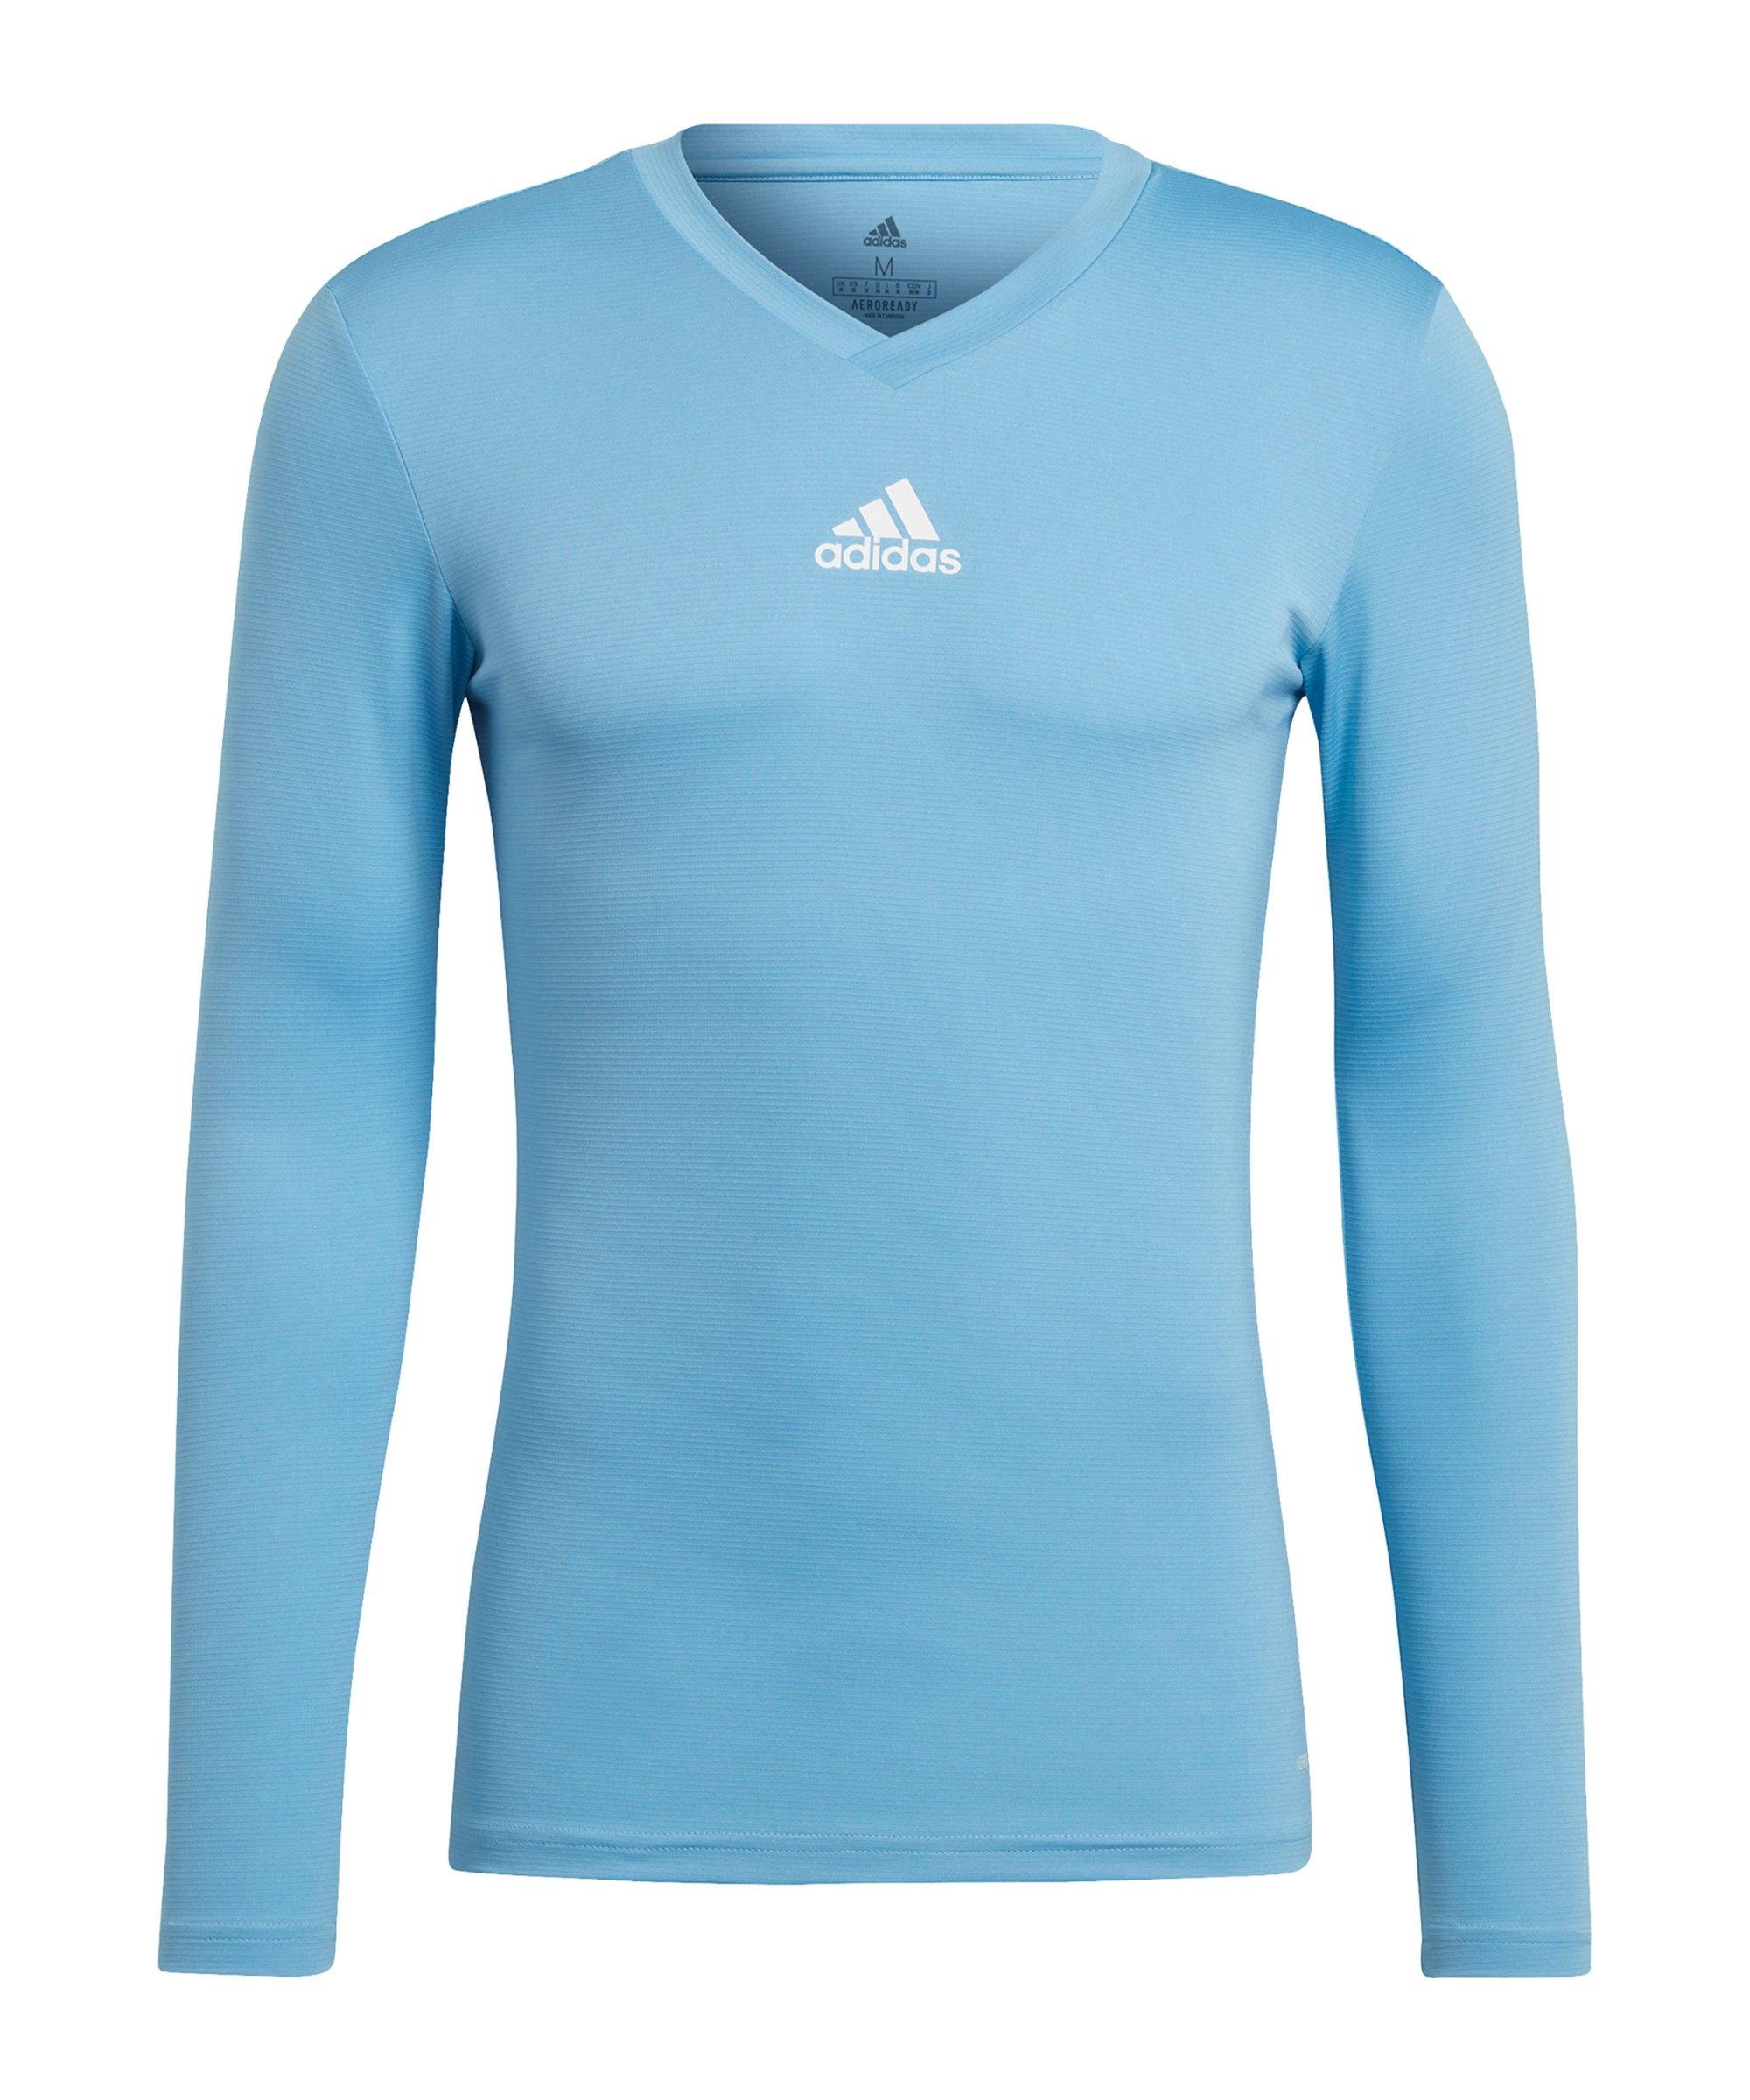 adidas Team Base Top langarm Blau - blau